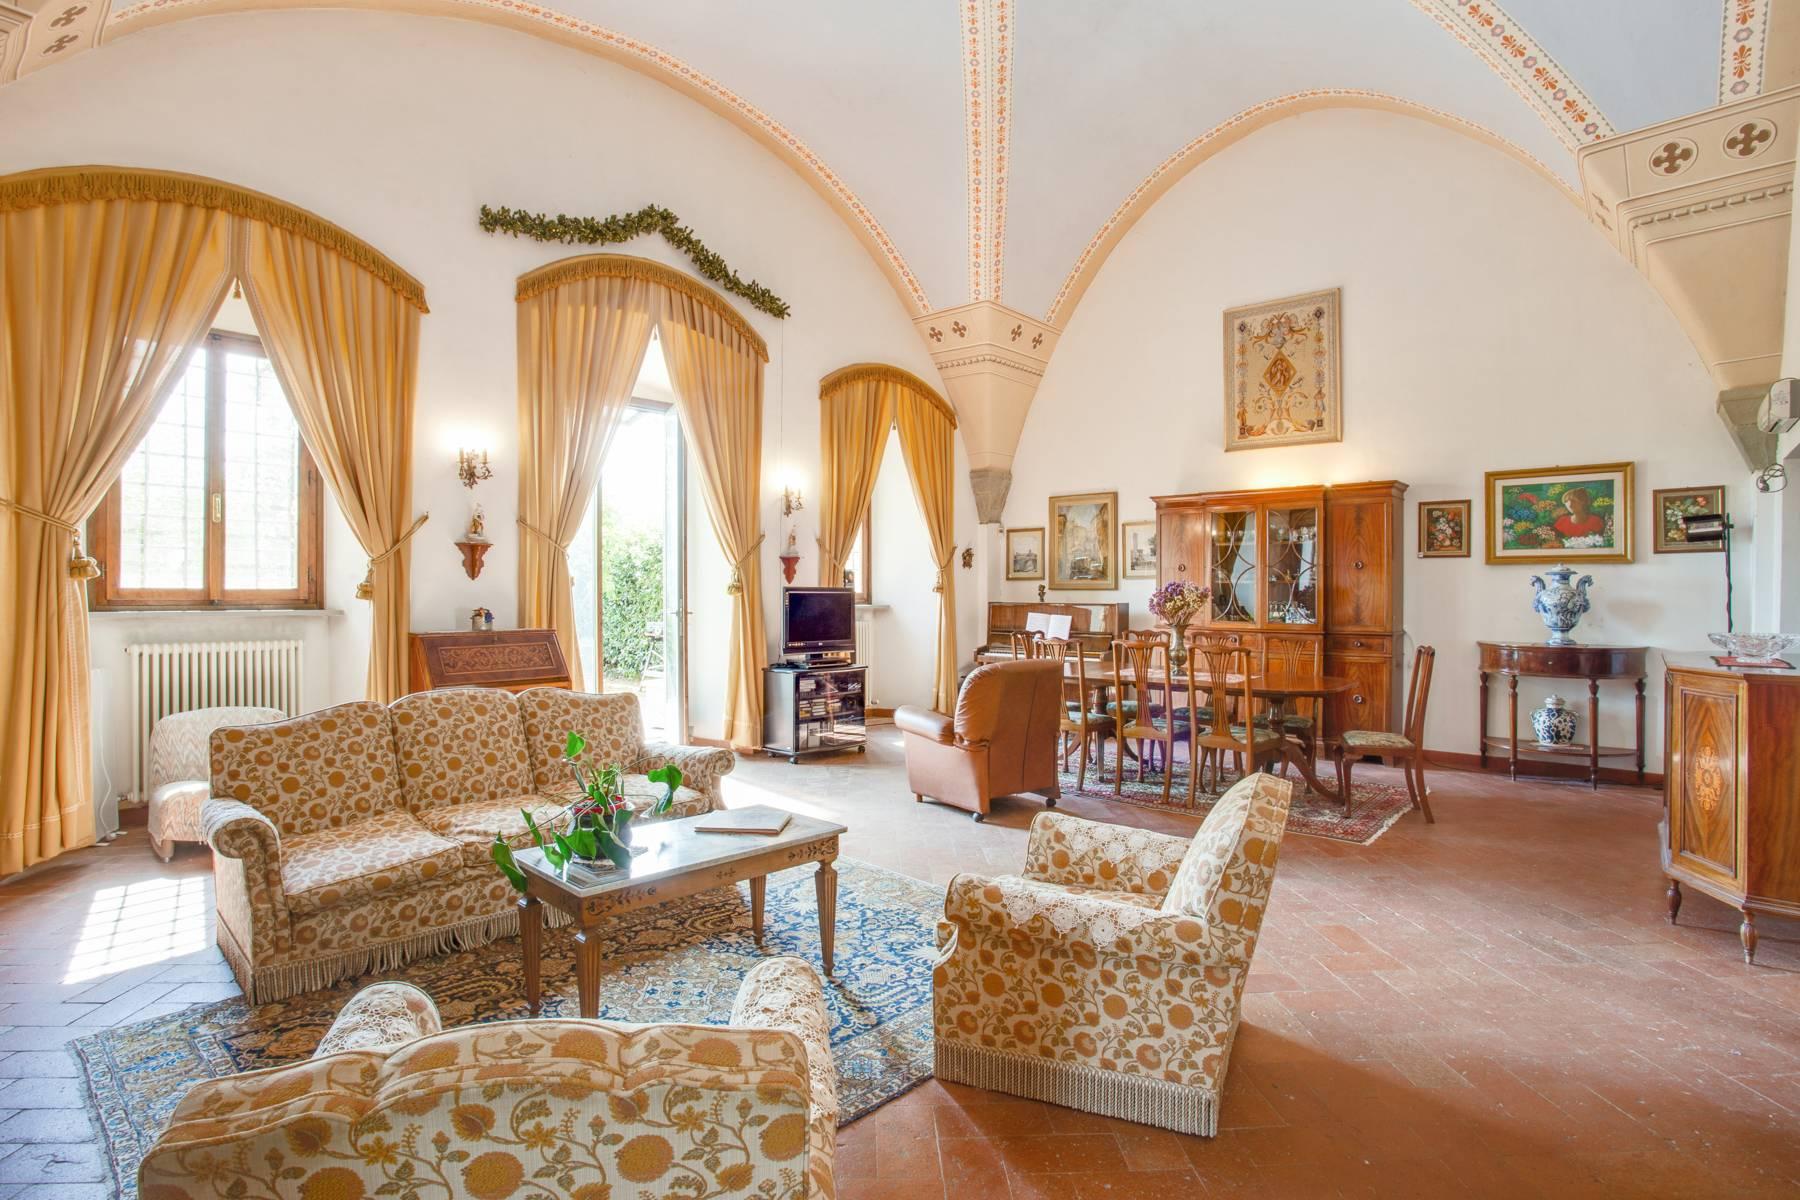 Appartamento in Vendita a Scandicci: 5 locali, 170 mq - Foto 5